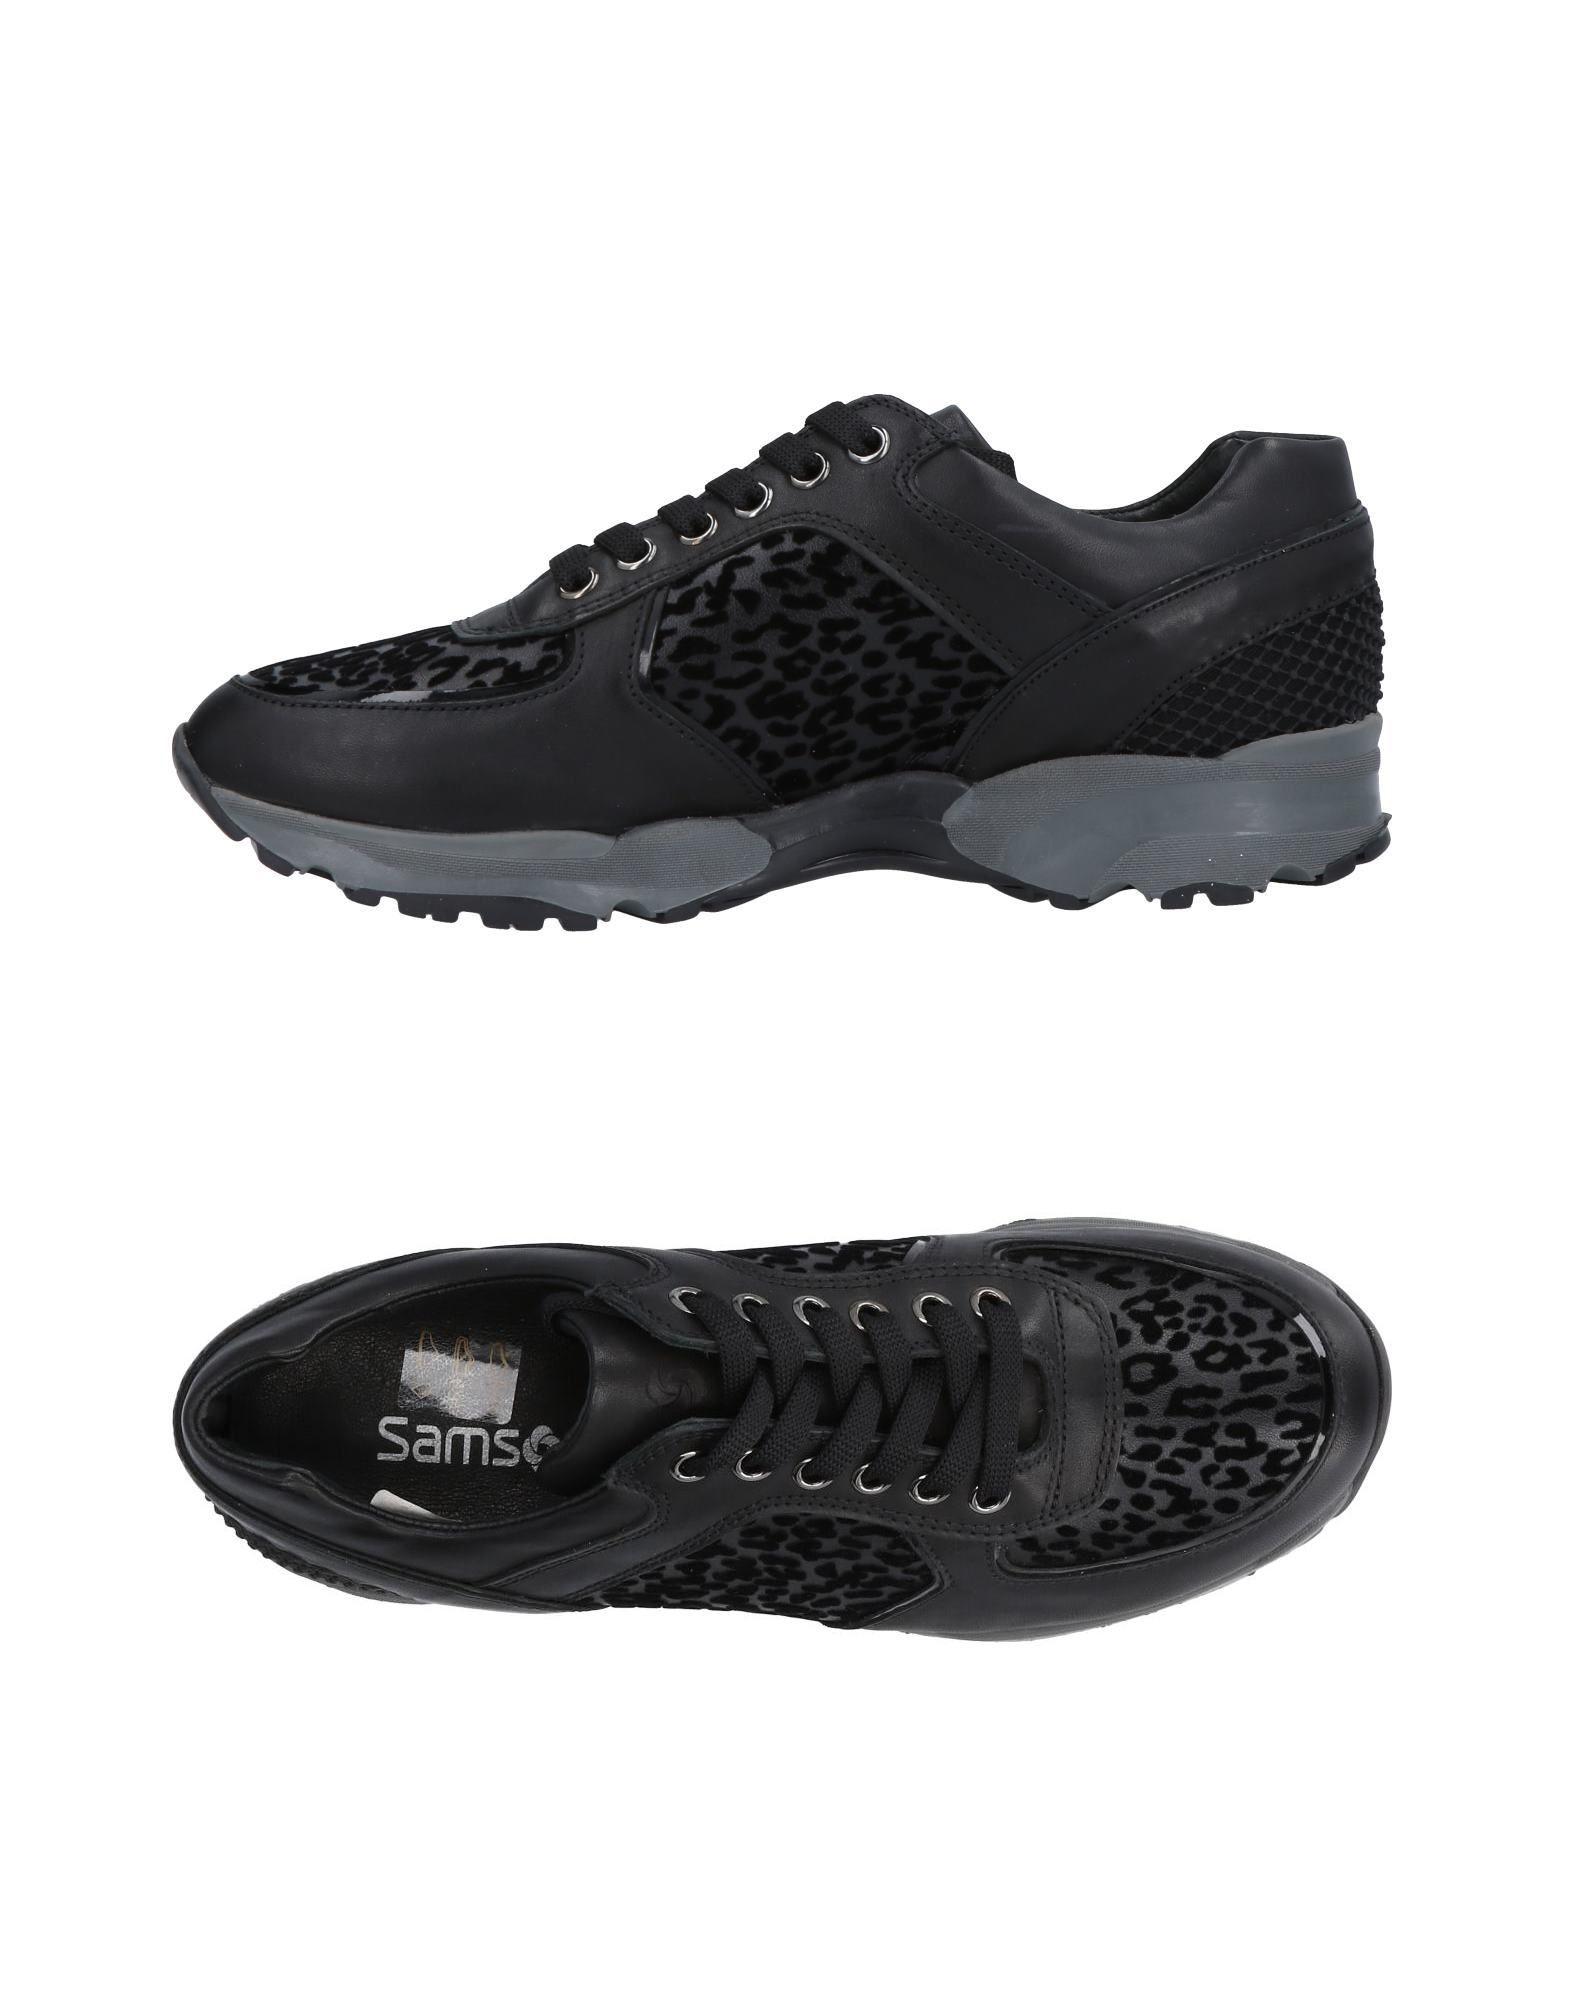 SAMSONITE Sneakers in Black